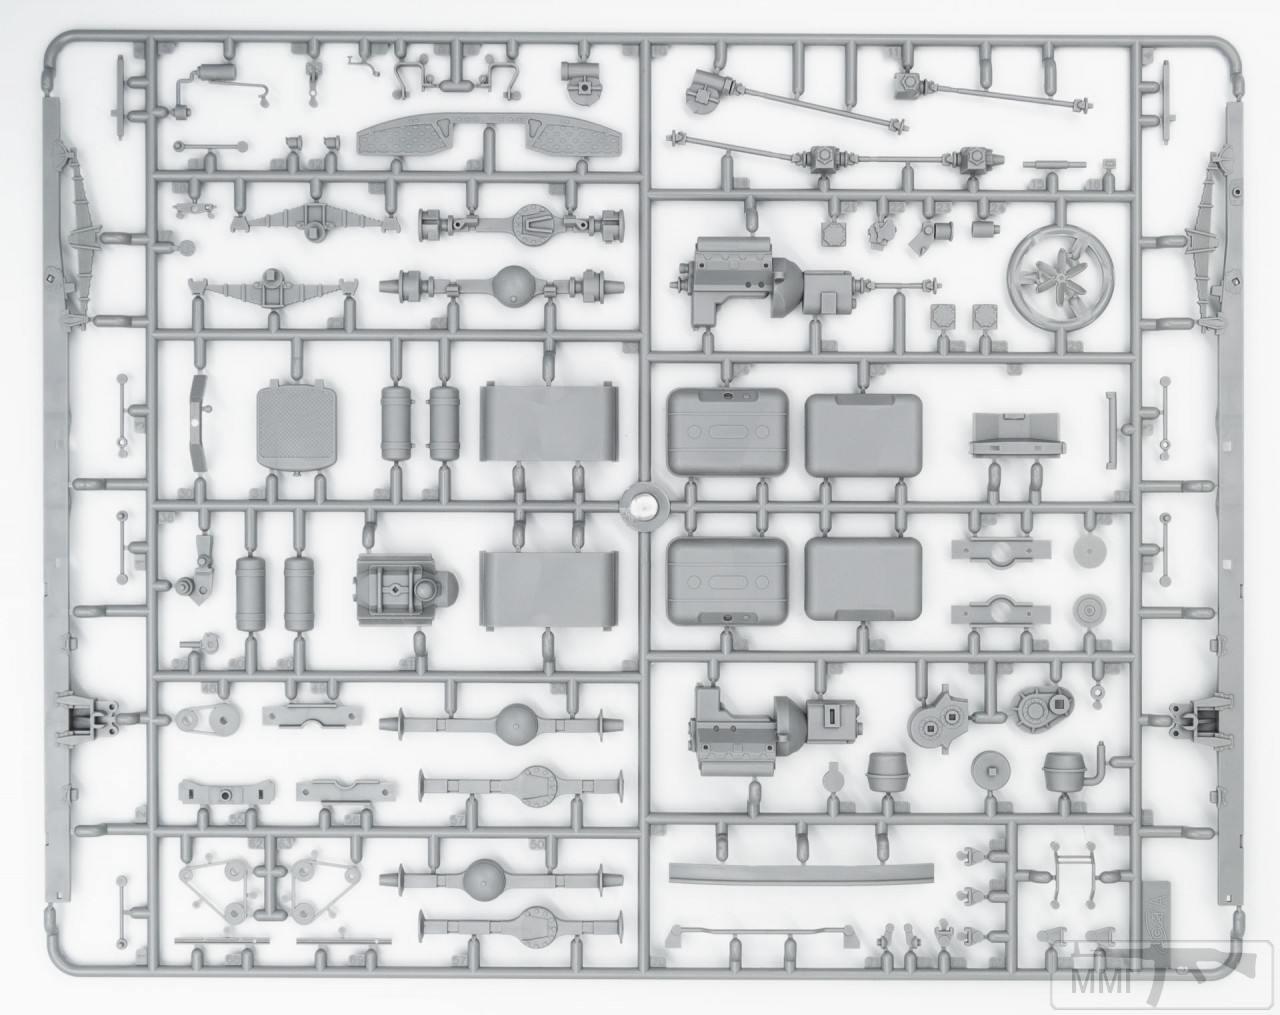 99849 - Обзор моделей и афтемаркета.